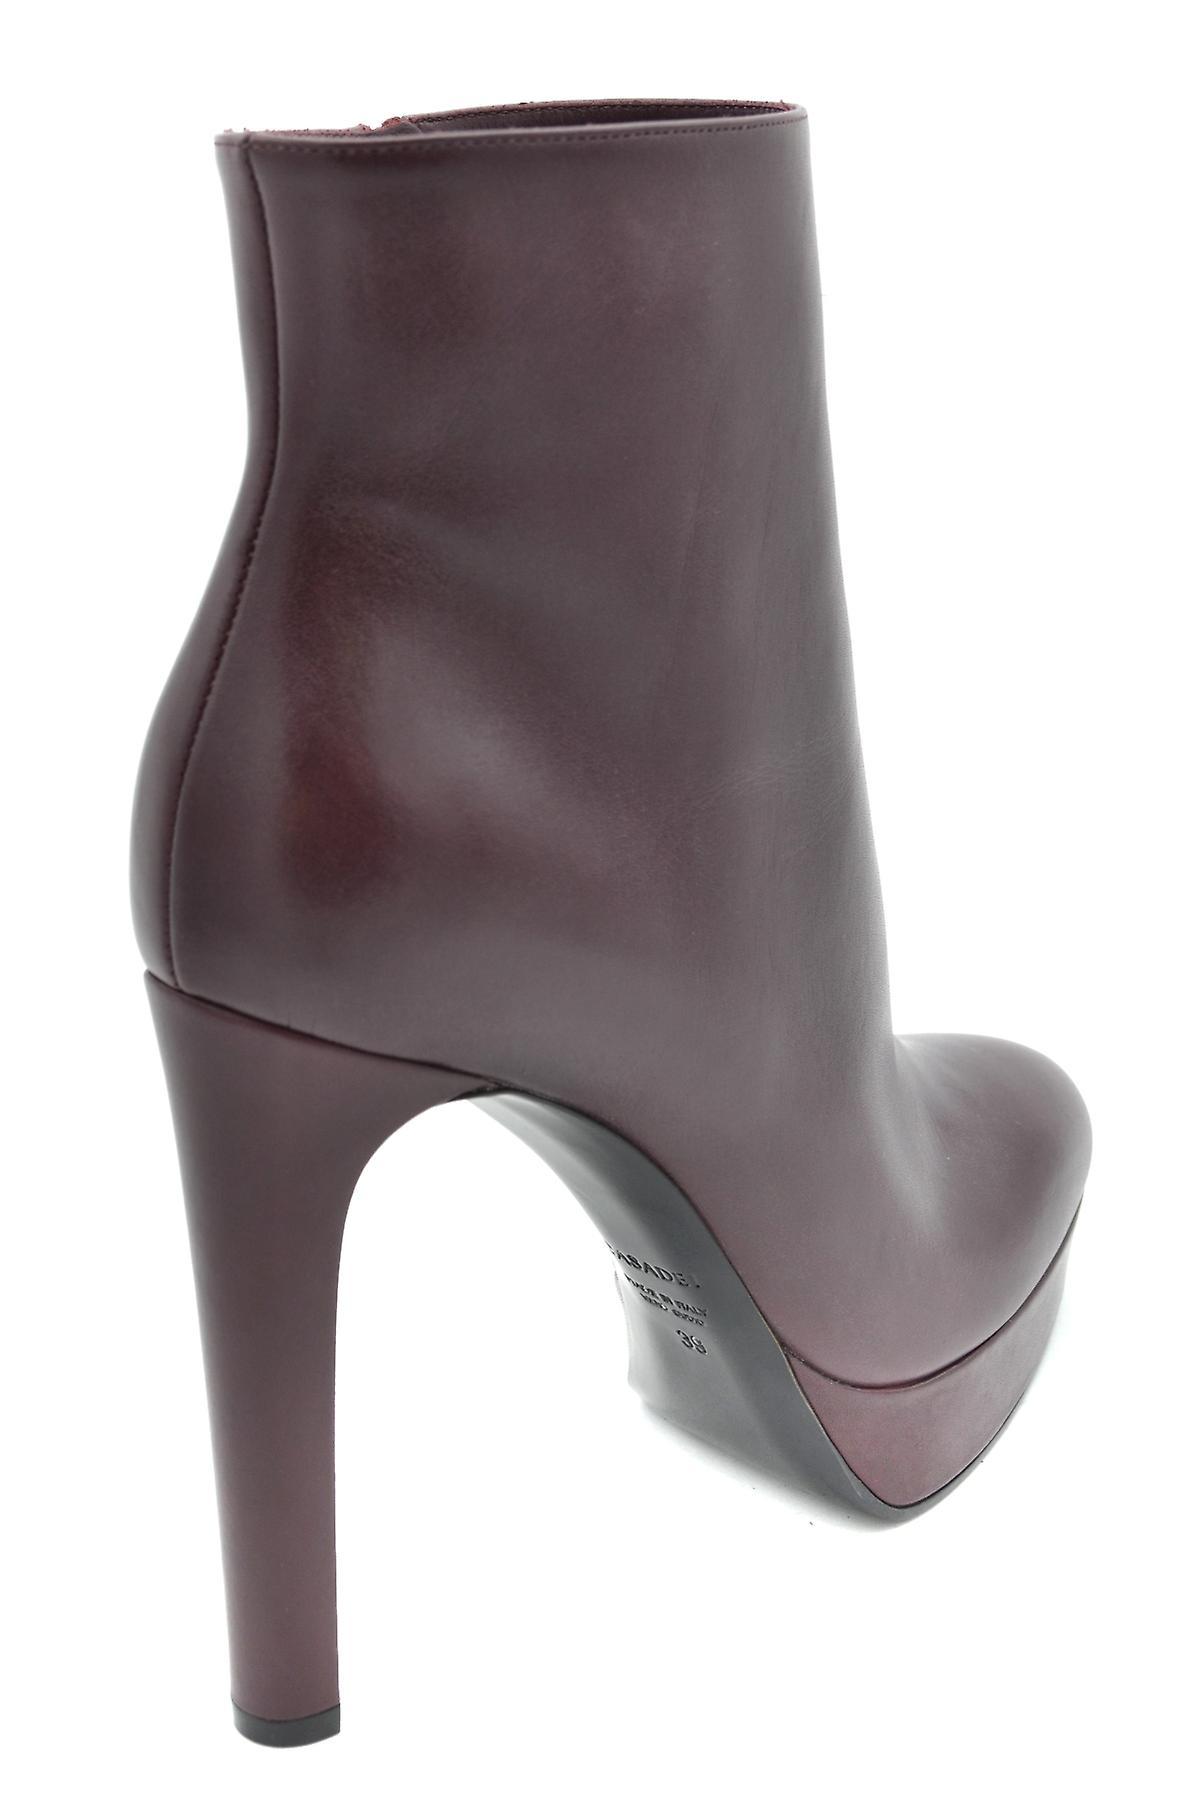 Casadei Ezbc038006 Women's Burgundy Leather Ankle Boots